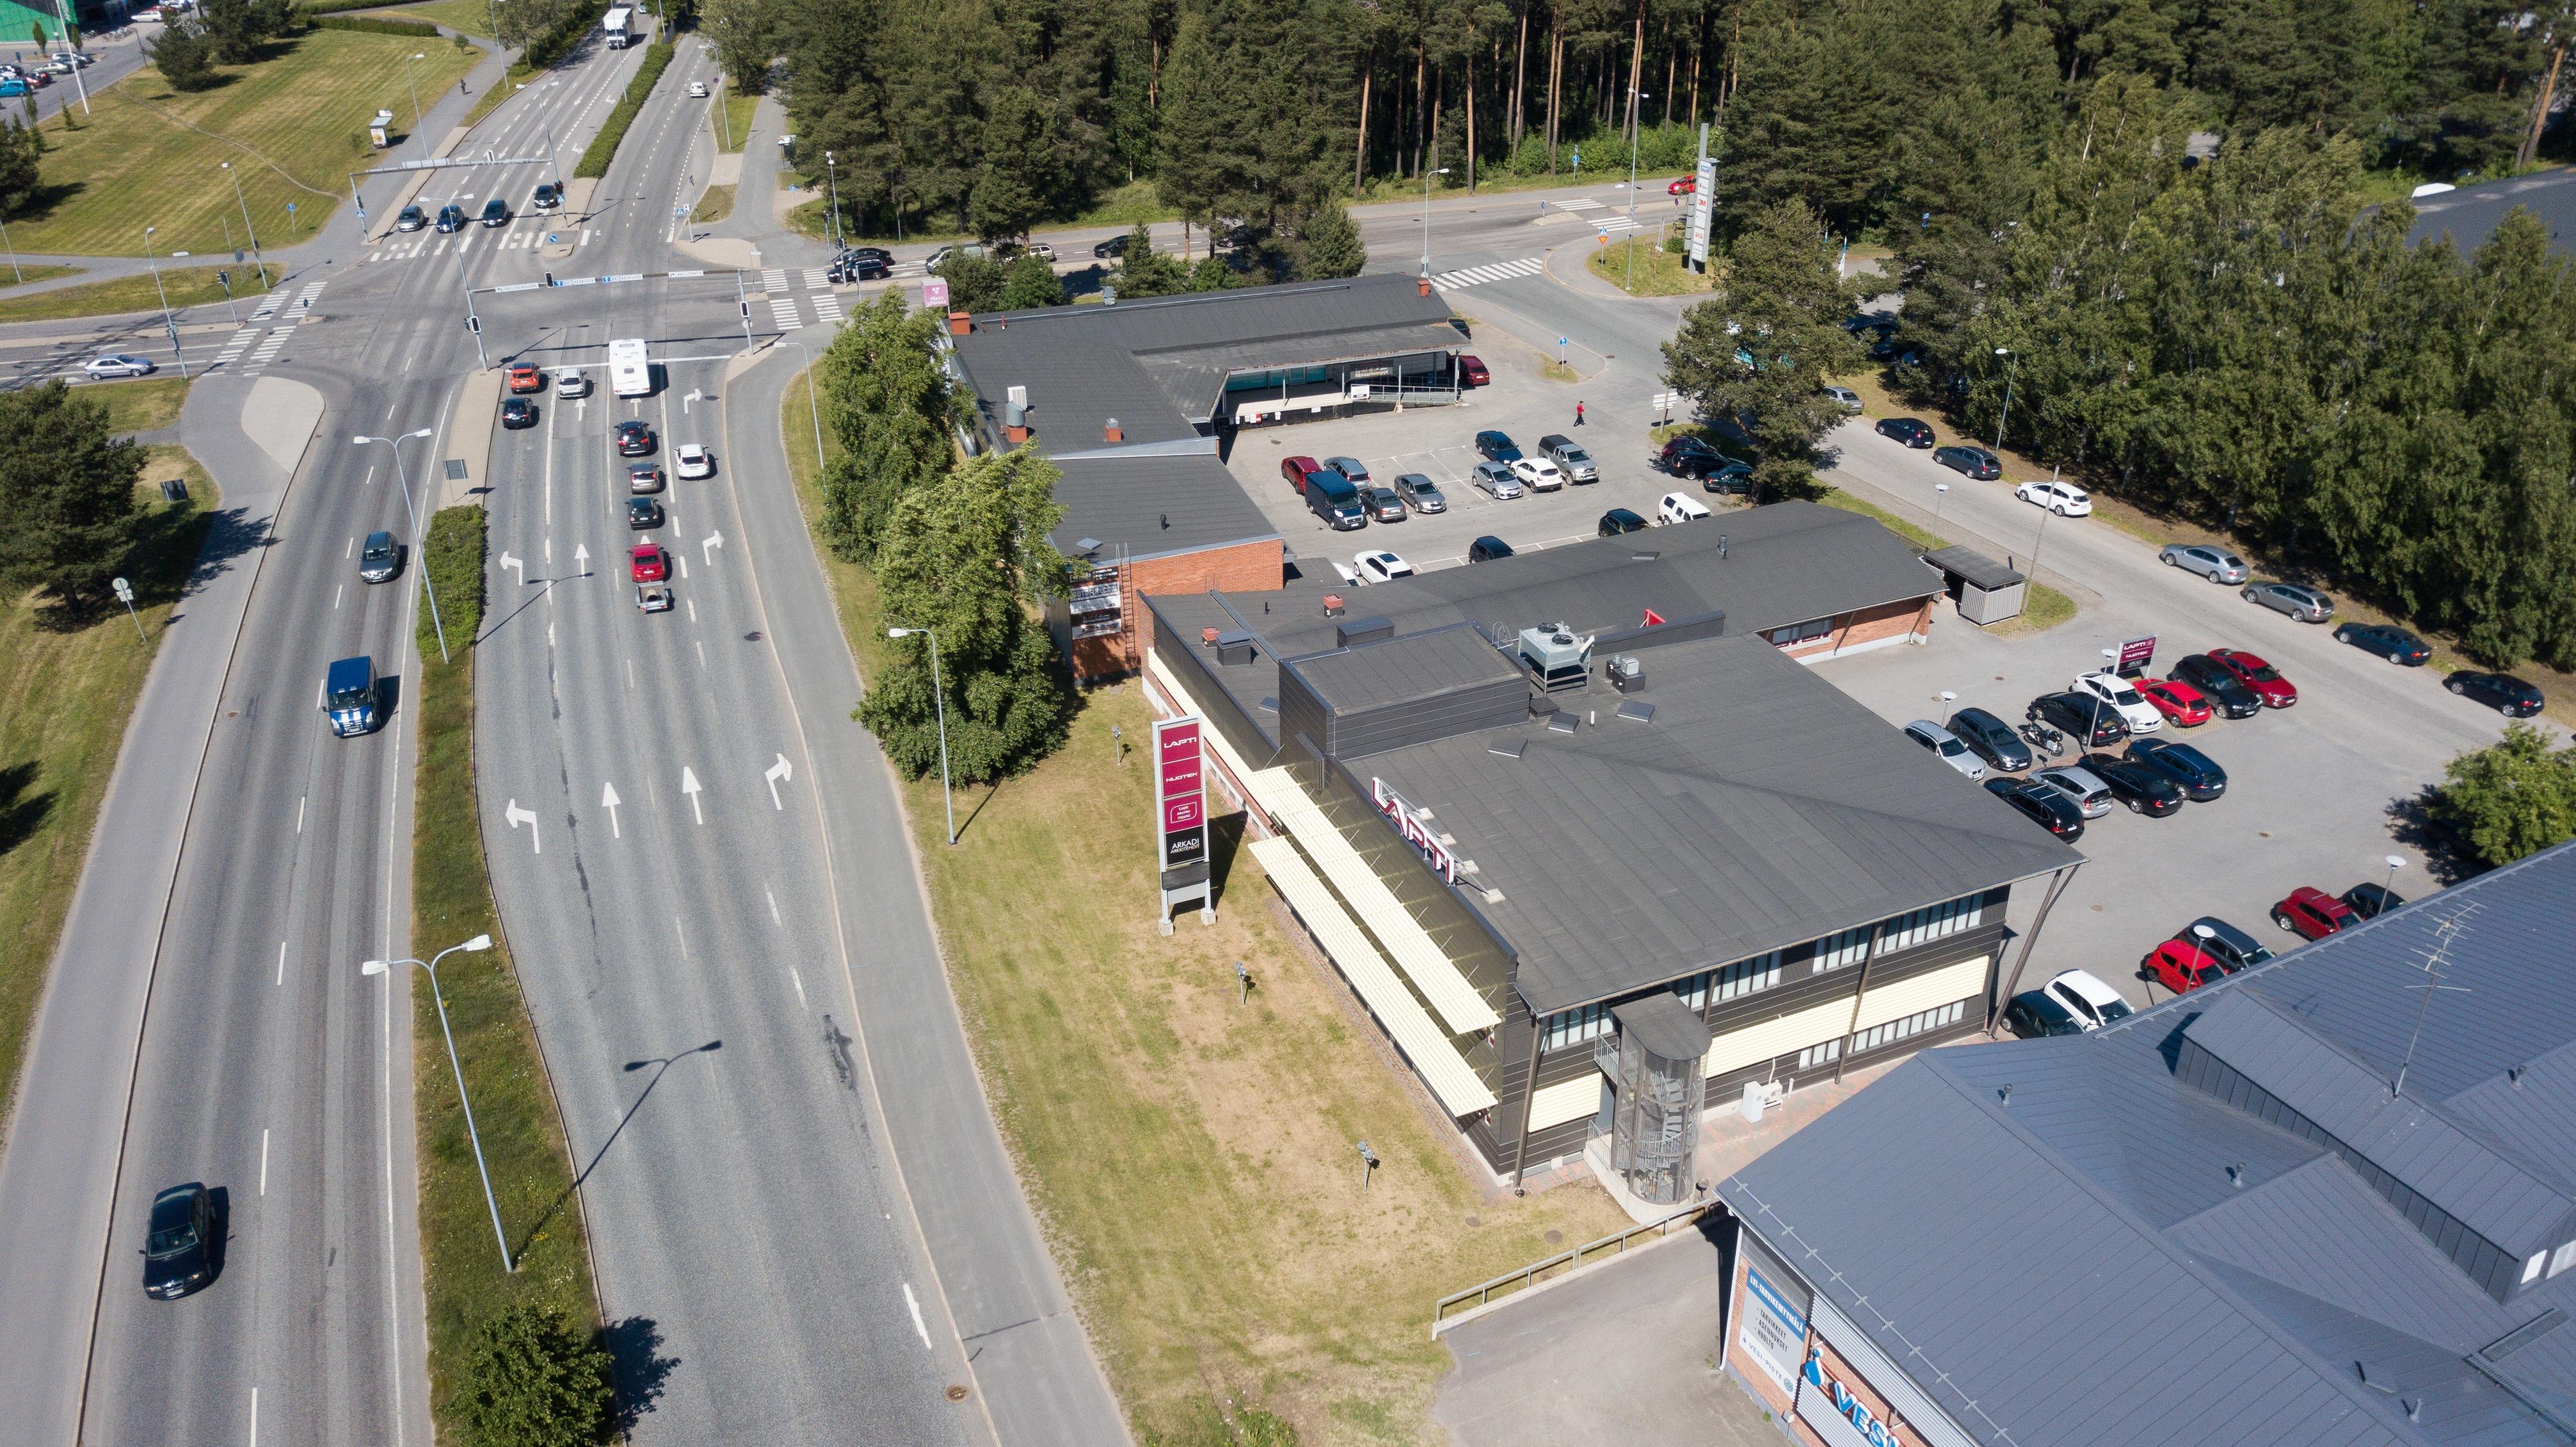 Toimitila, Voudintie 4, Limingantulli, Oulu